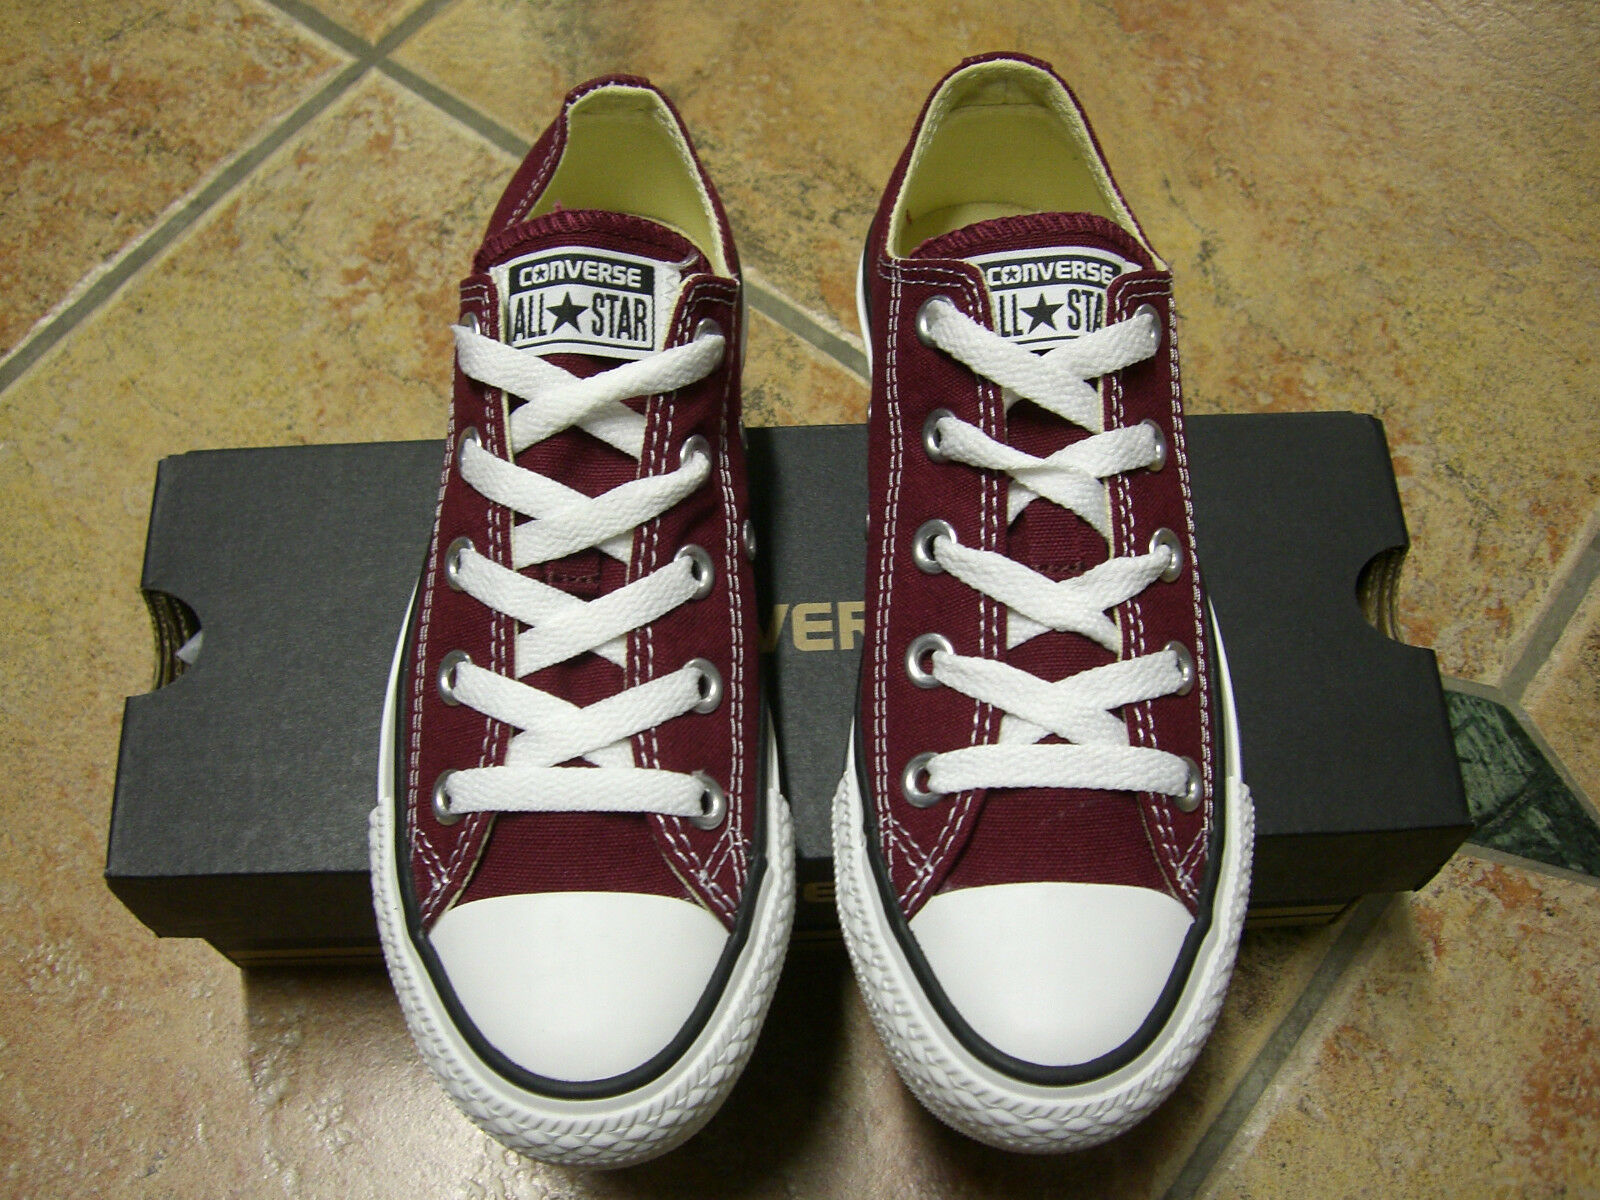 Converse Chucks All Star OX Größe 37  MAROON WEINROT M9691C  Neu